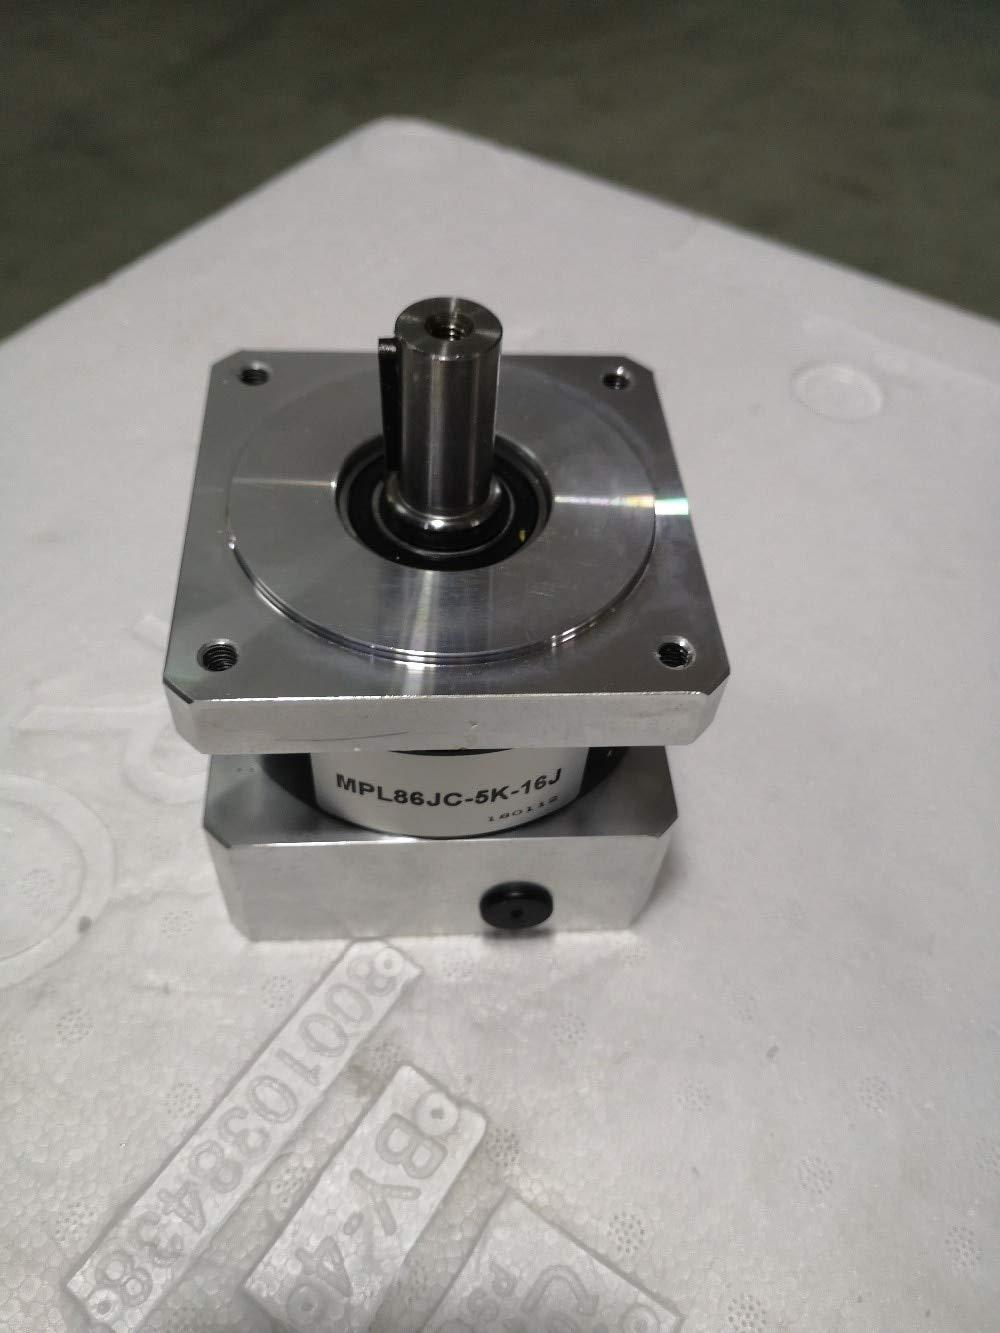 1 3//8^^ Wide Inner Race Insert Triple IPTCI NAT207-22-L3 Take Up Unit Eccentric Locking Collar Wide Slot Bore Dia